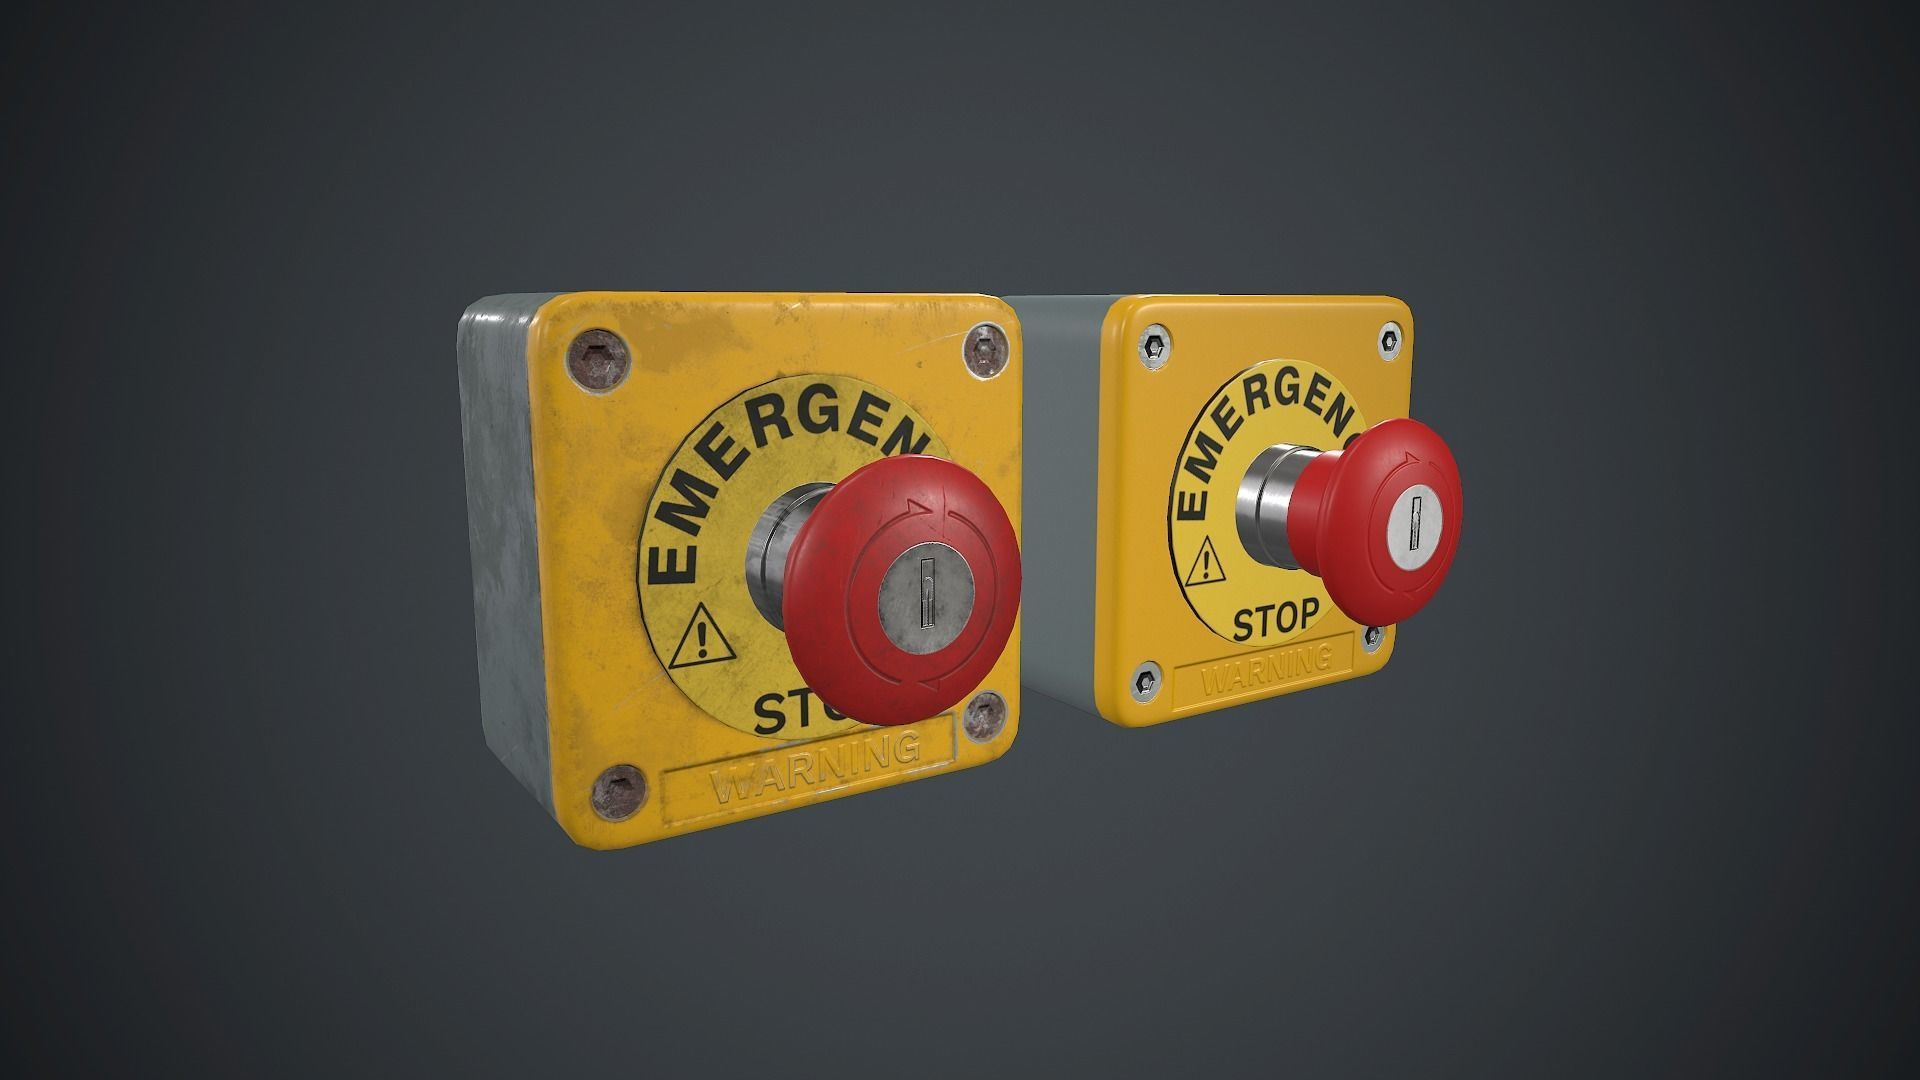 Emergency Button PBR Game Ready